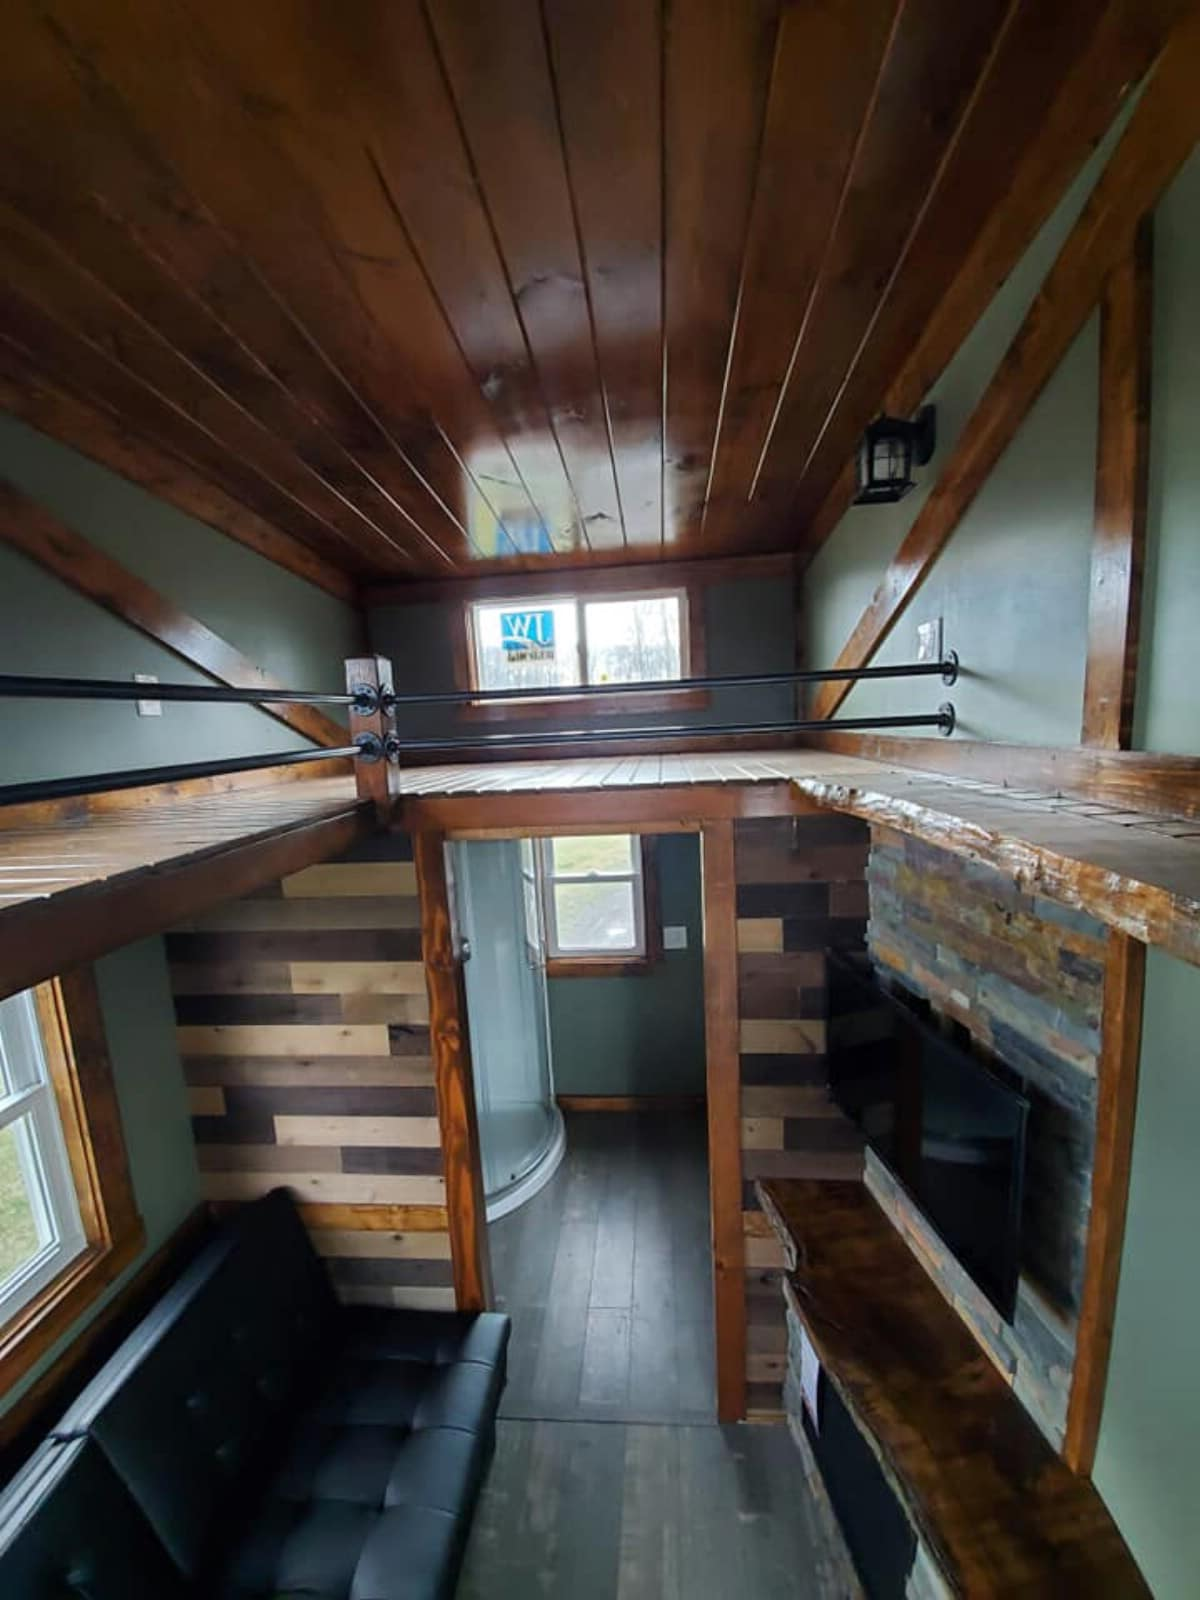 Loft above bathroom